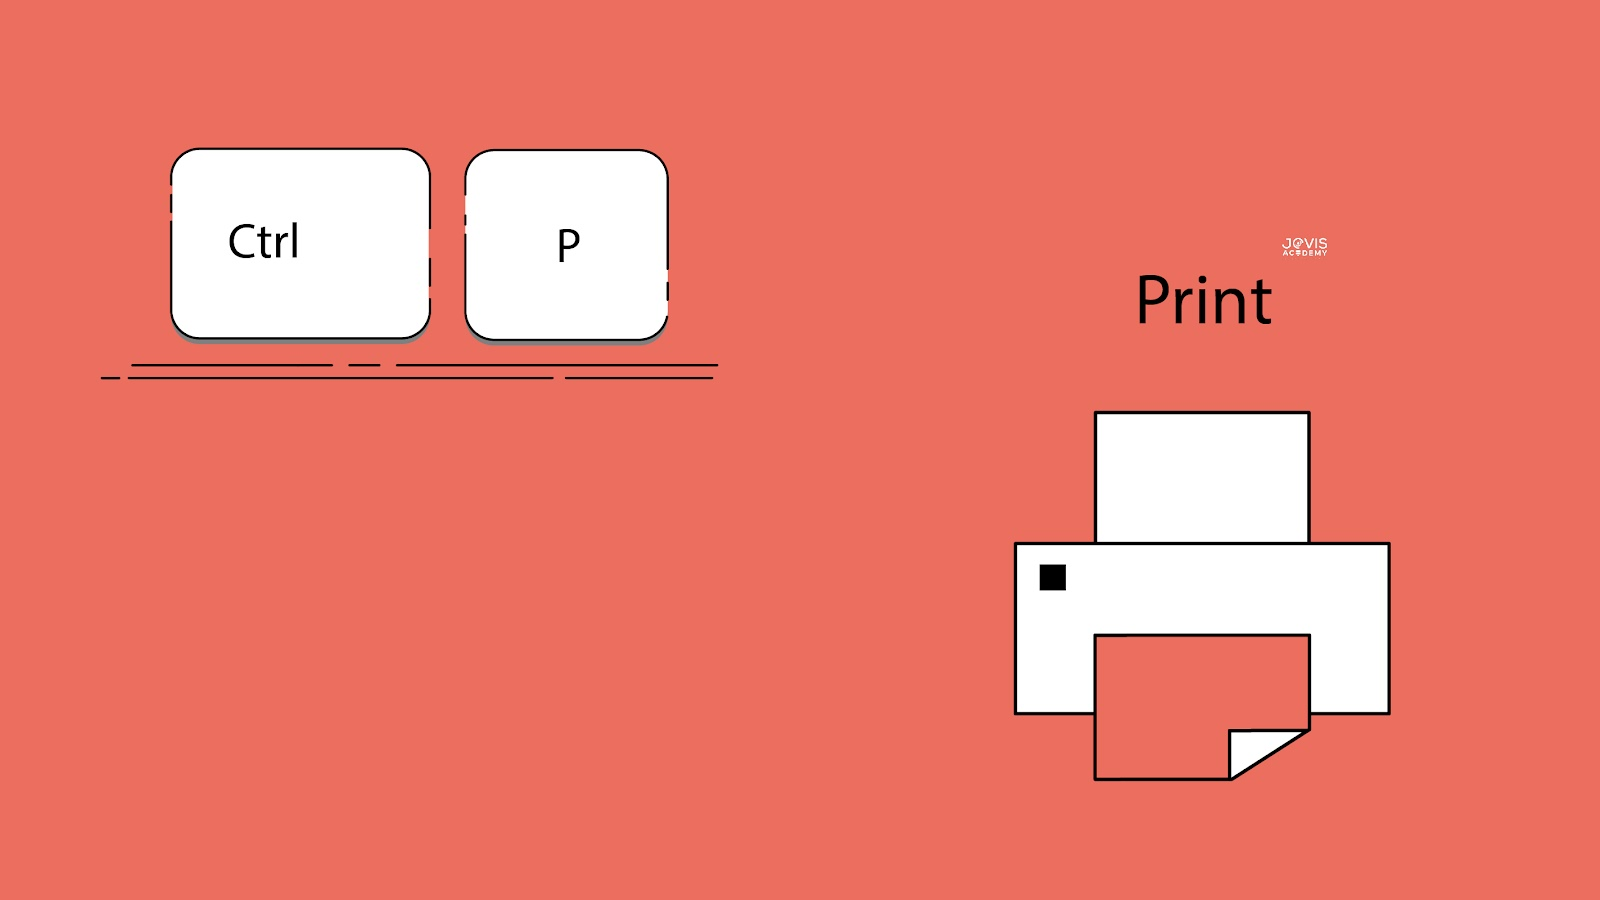 PHÍM TẮT TRONG POWERPOINT - POWERPOINT KEYBOARD SHORTCUTS